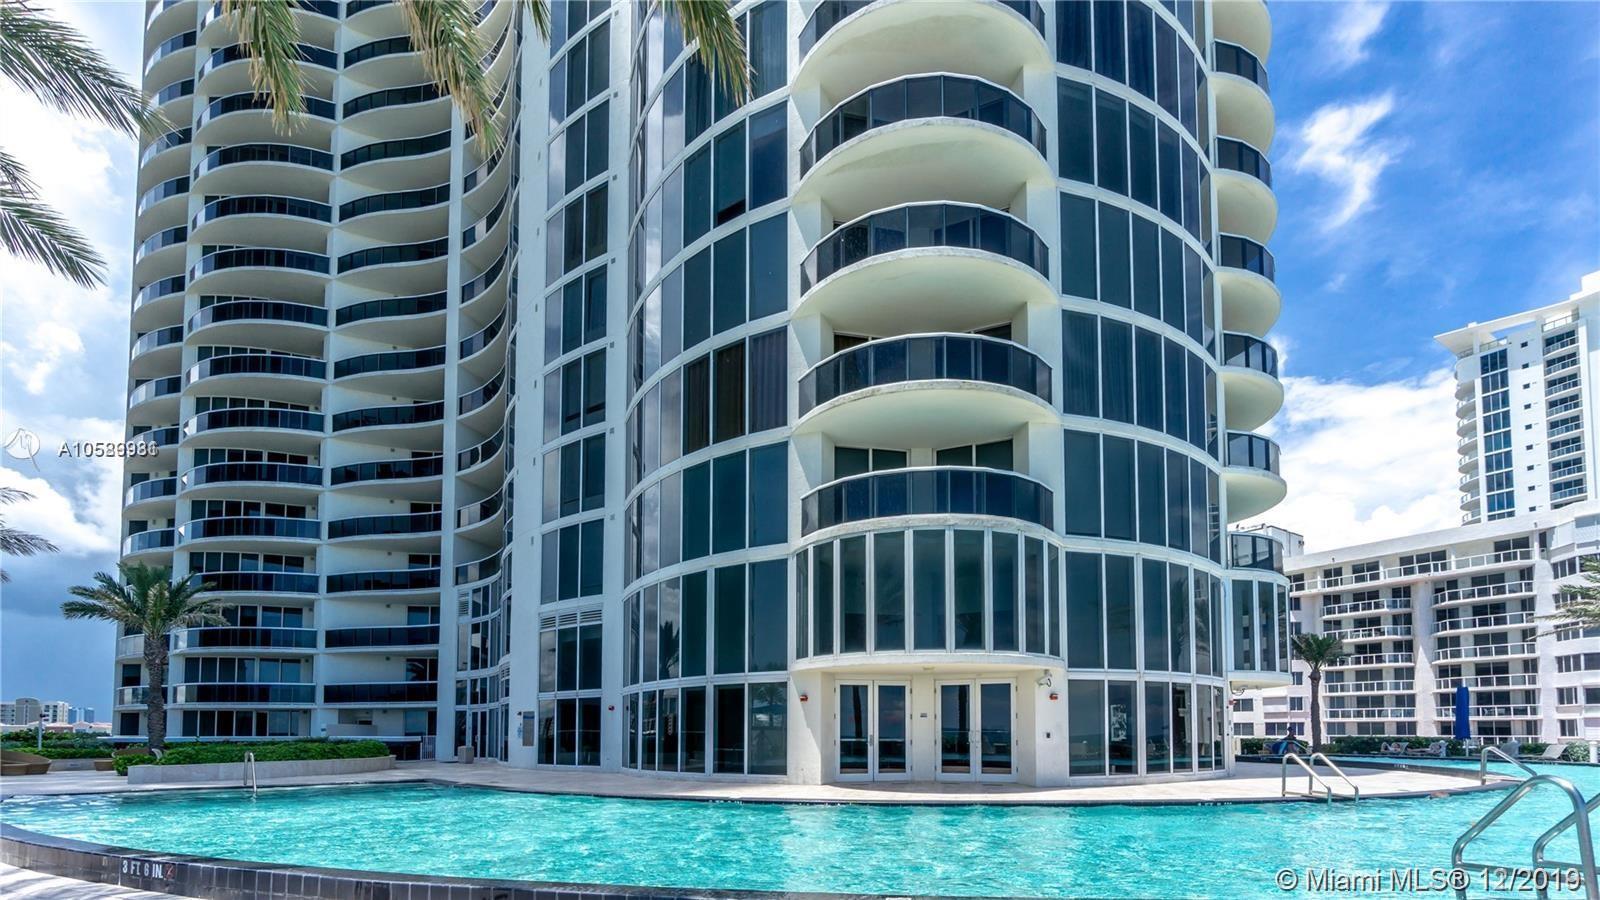 17201 Collins Ave 2801, Sunny Isles Beach, FL 33160